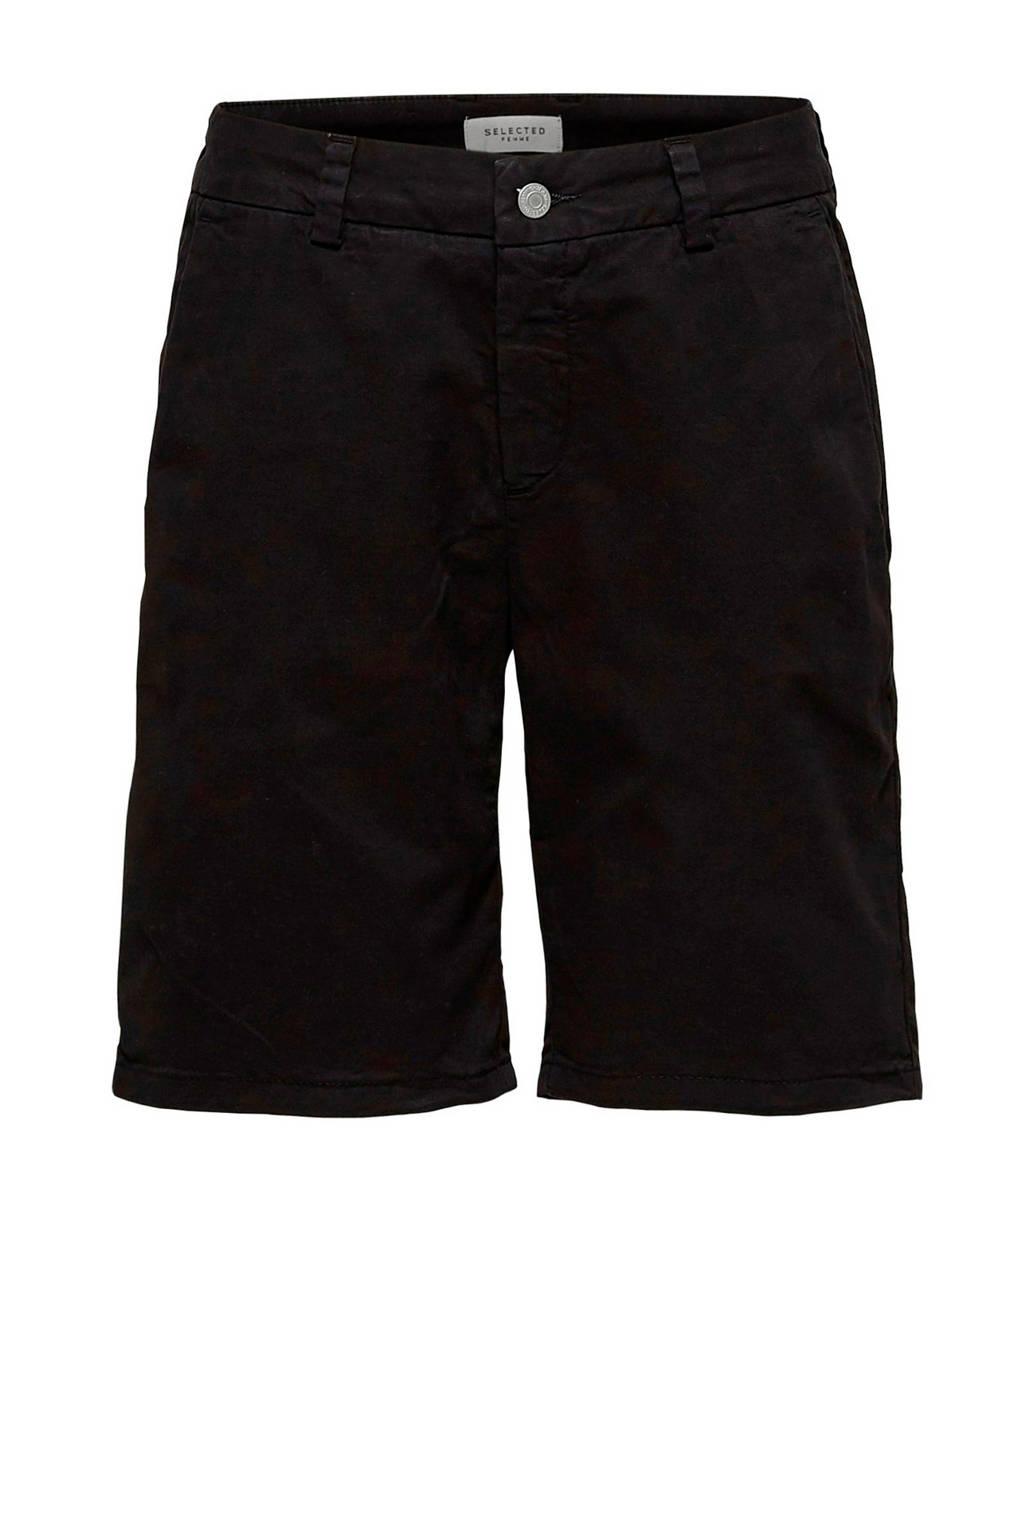 SELECTED FEMME straight fit jeans short zwart, Zwart